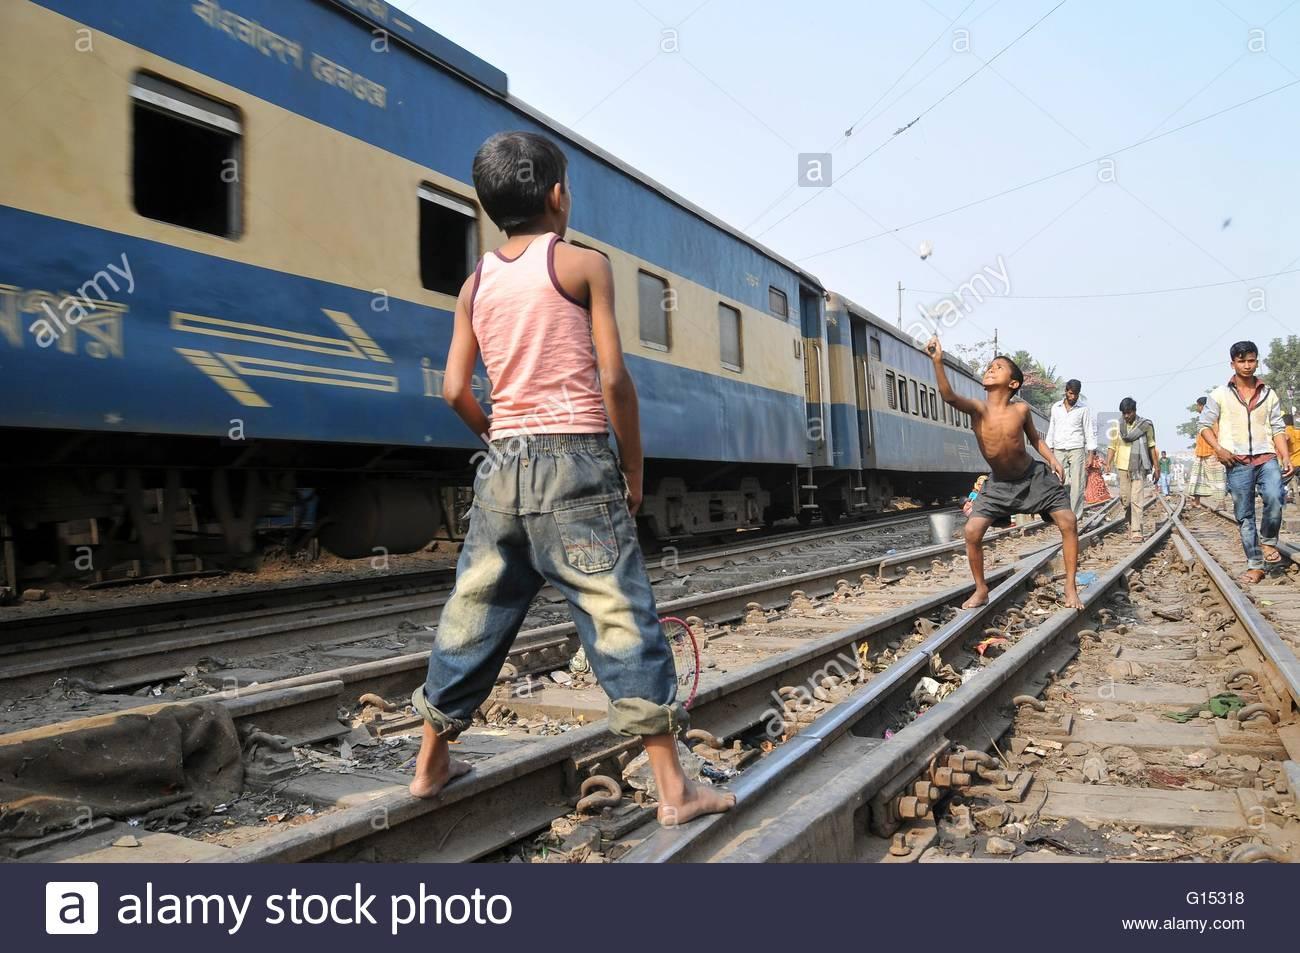 Bangladesh, Dhaka, children playing on rail tracks - Stock Image